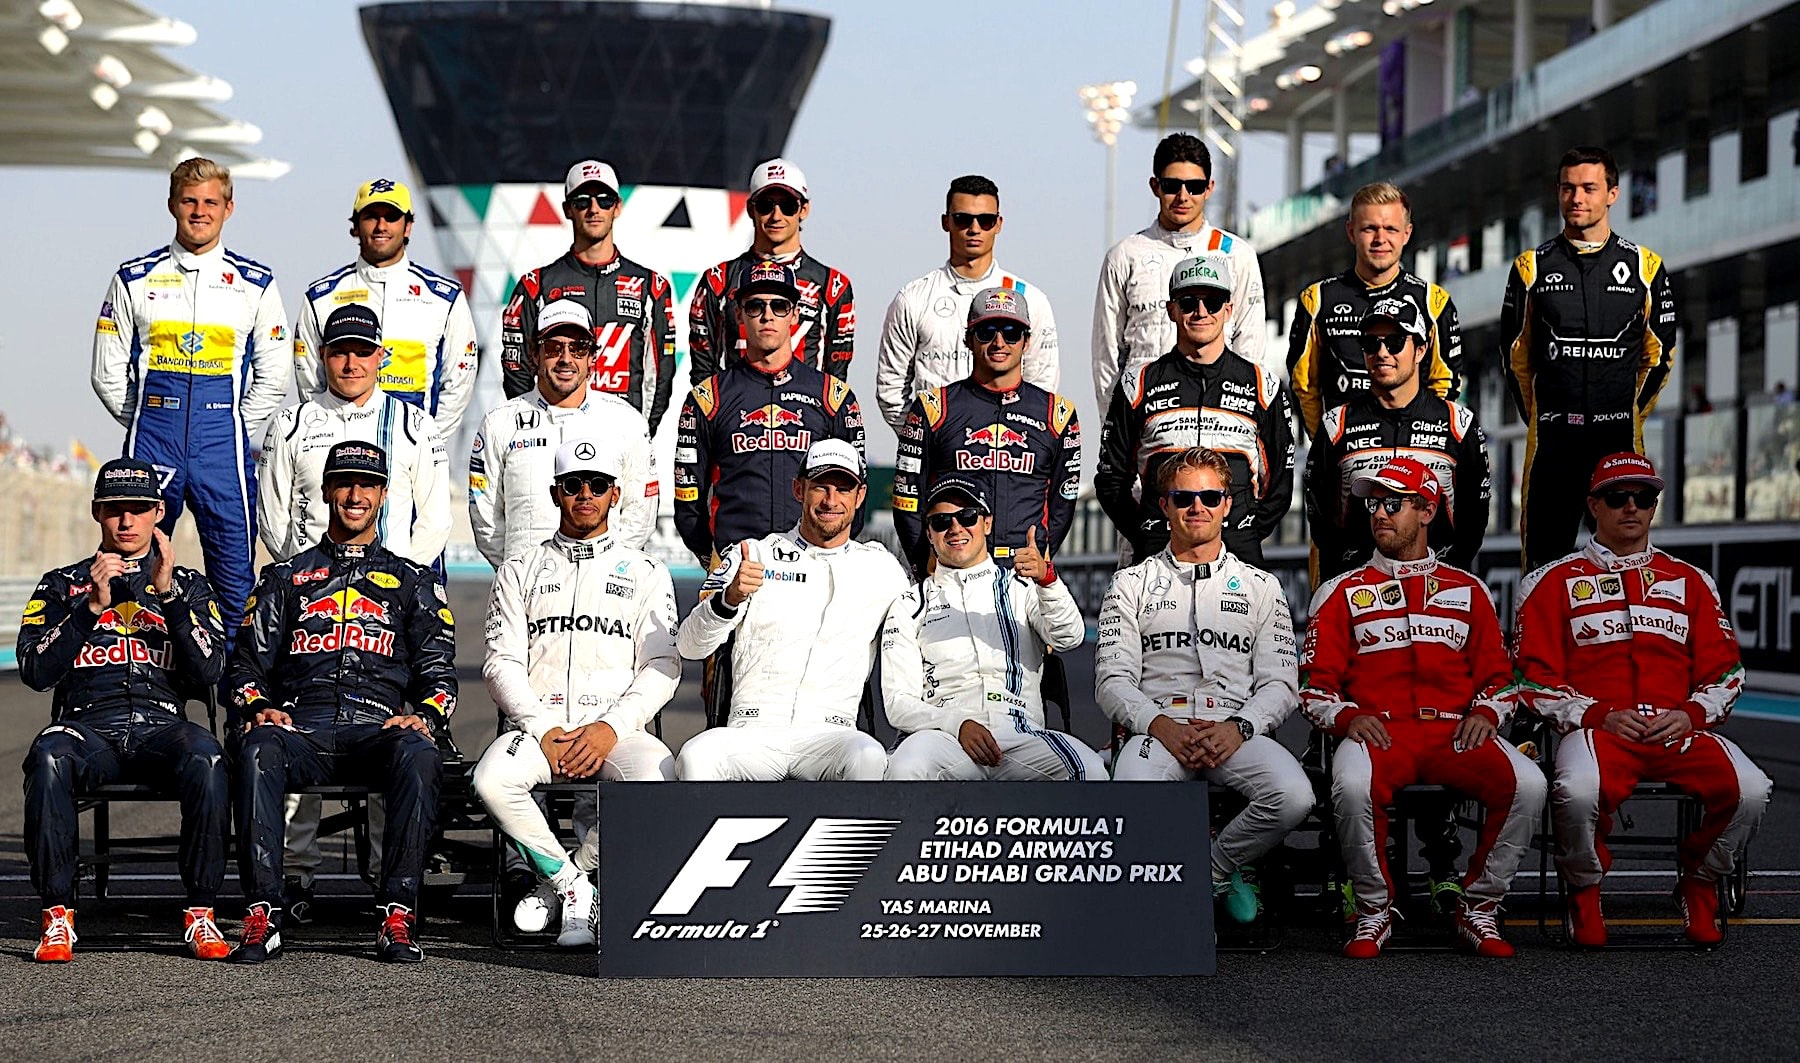 Formula One Class of 2016